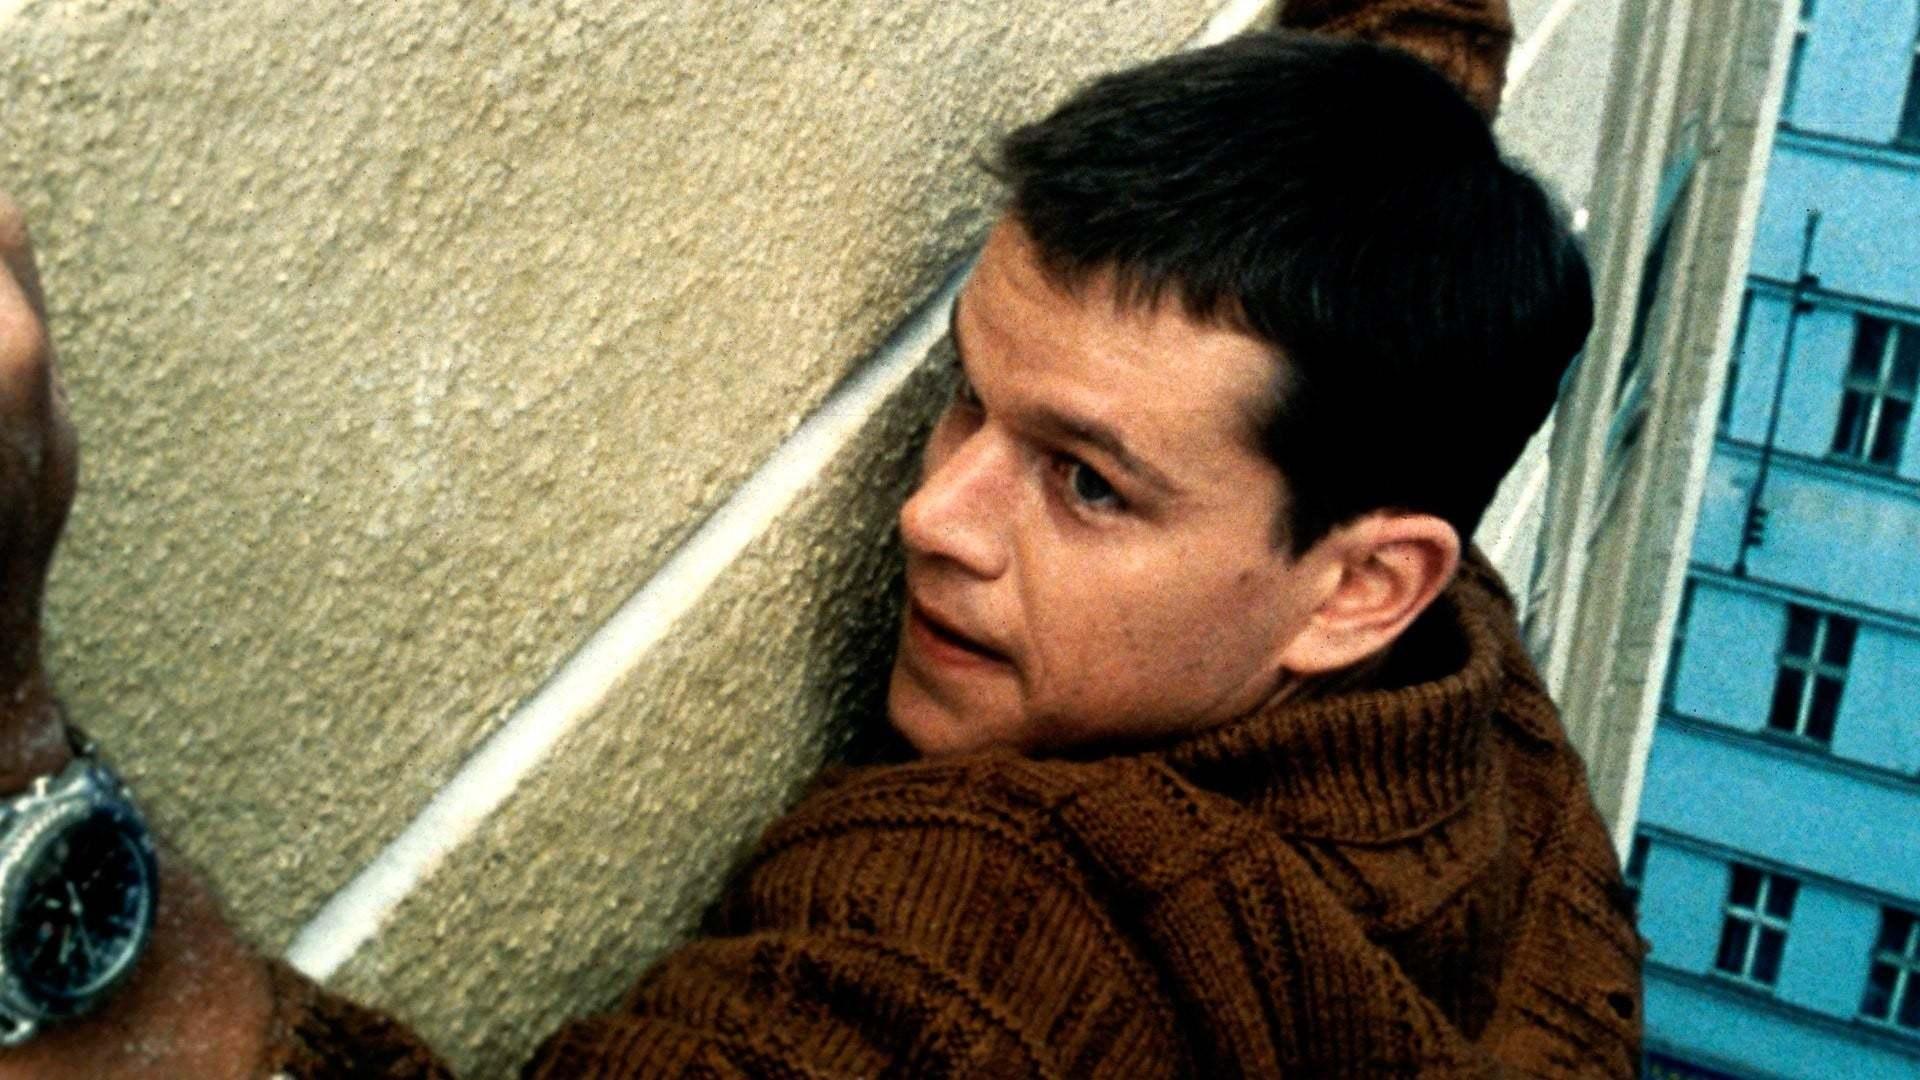 Кадры из фильма Идентификация Борна The Bourne Identity 2002